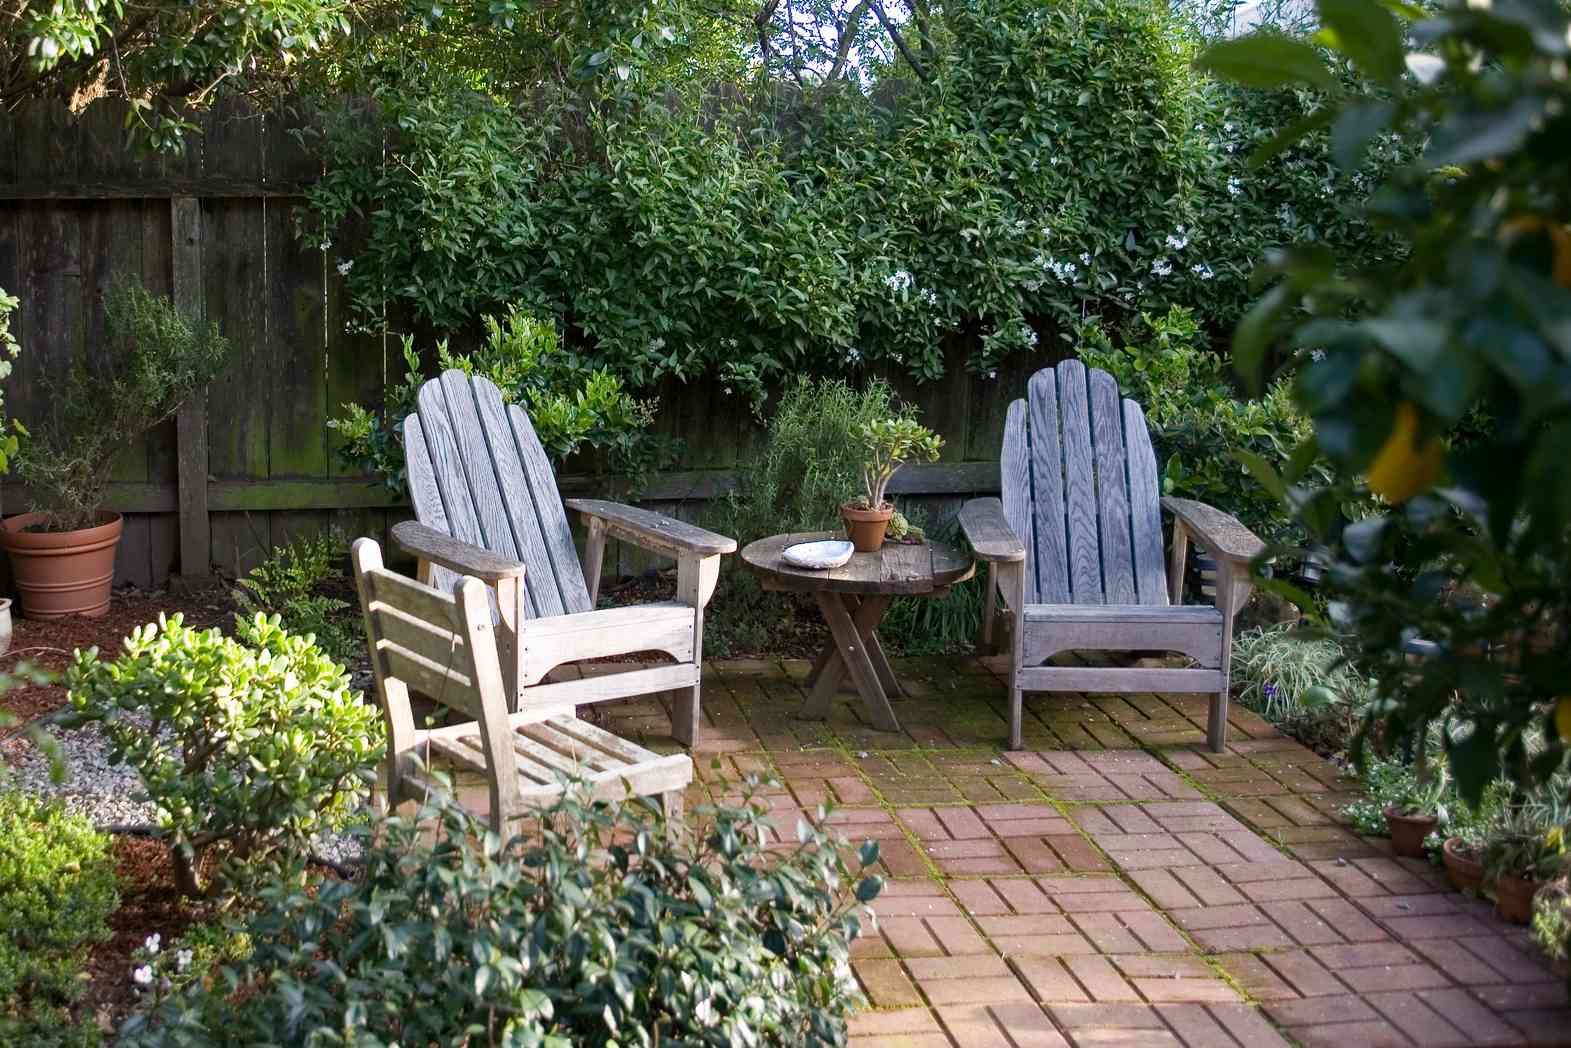 Weathered teak furniture on a patio